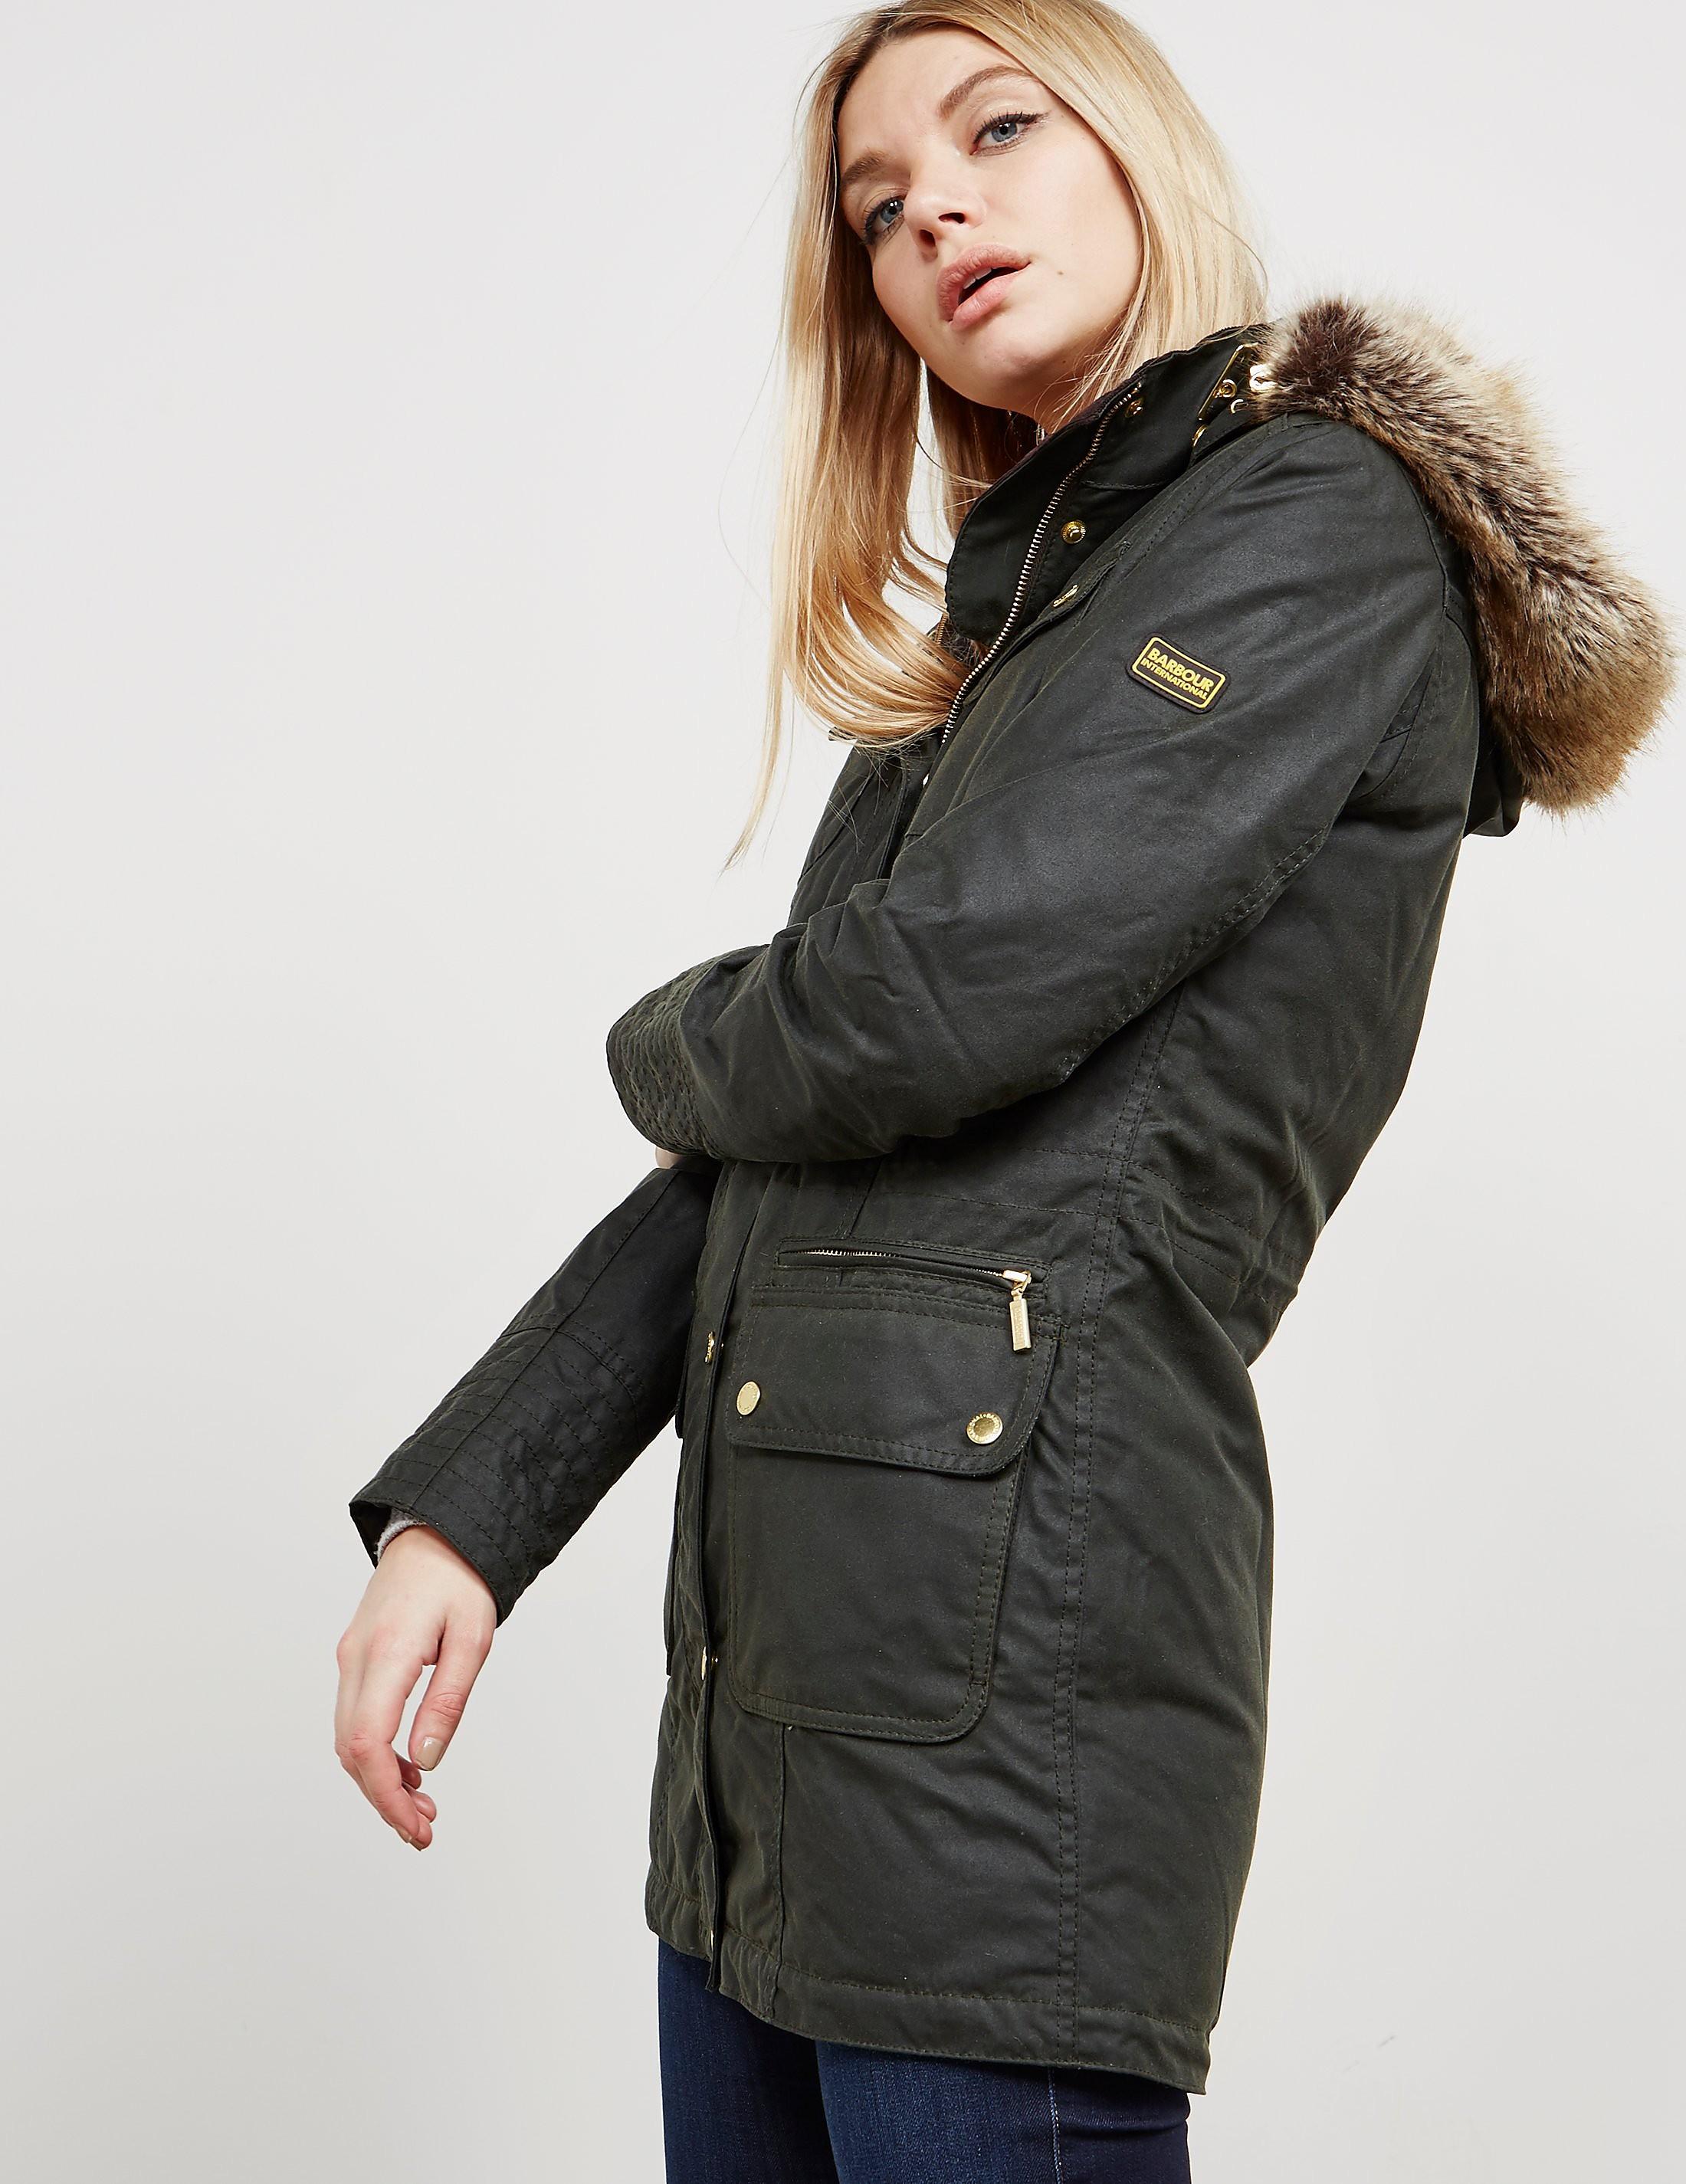 Barbour International Malloy Wax Jacket - Online Exclusive